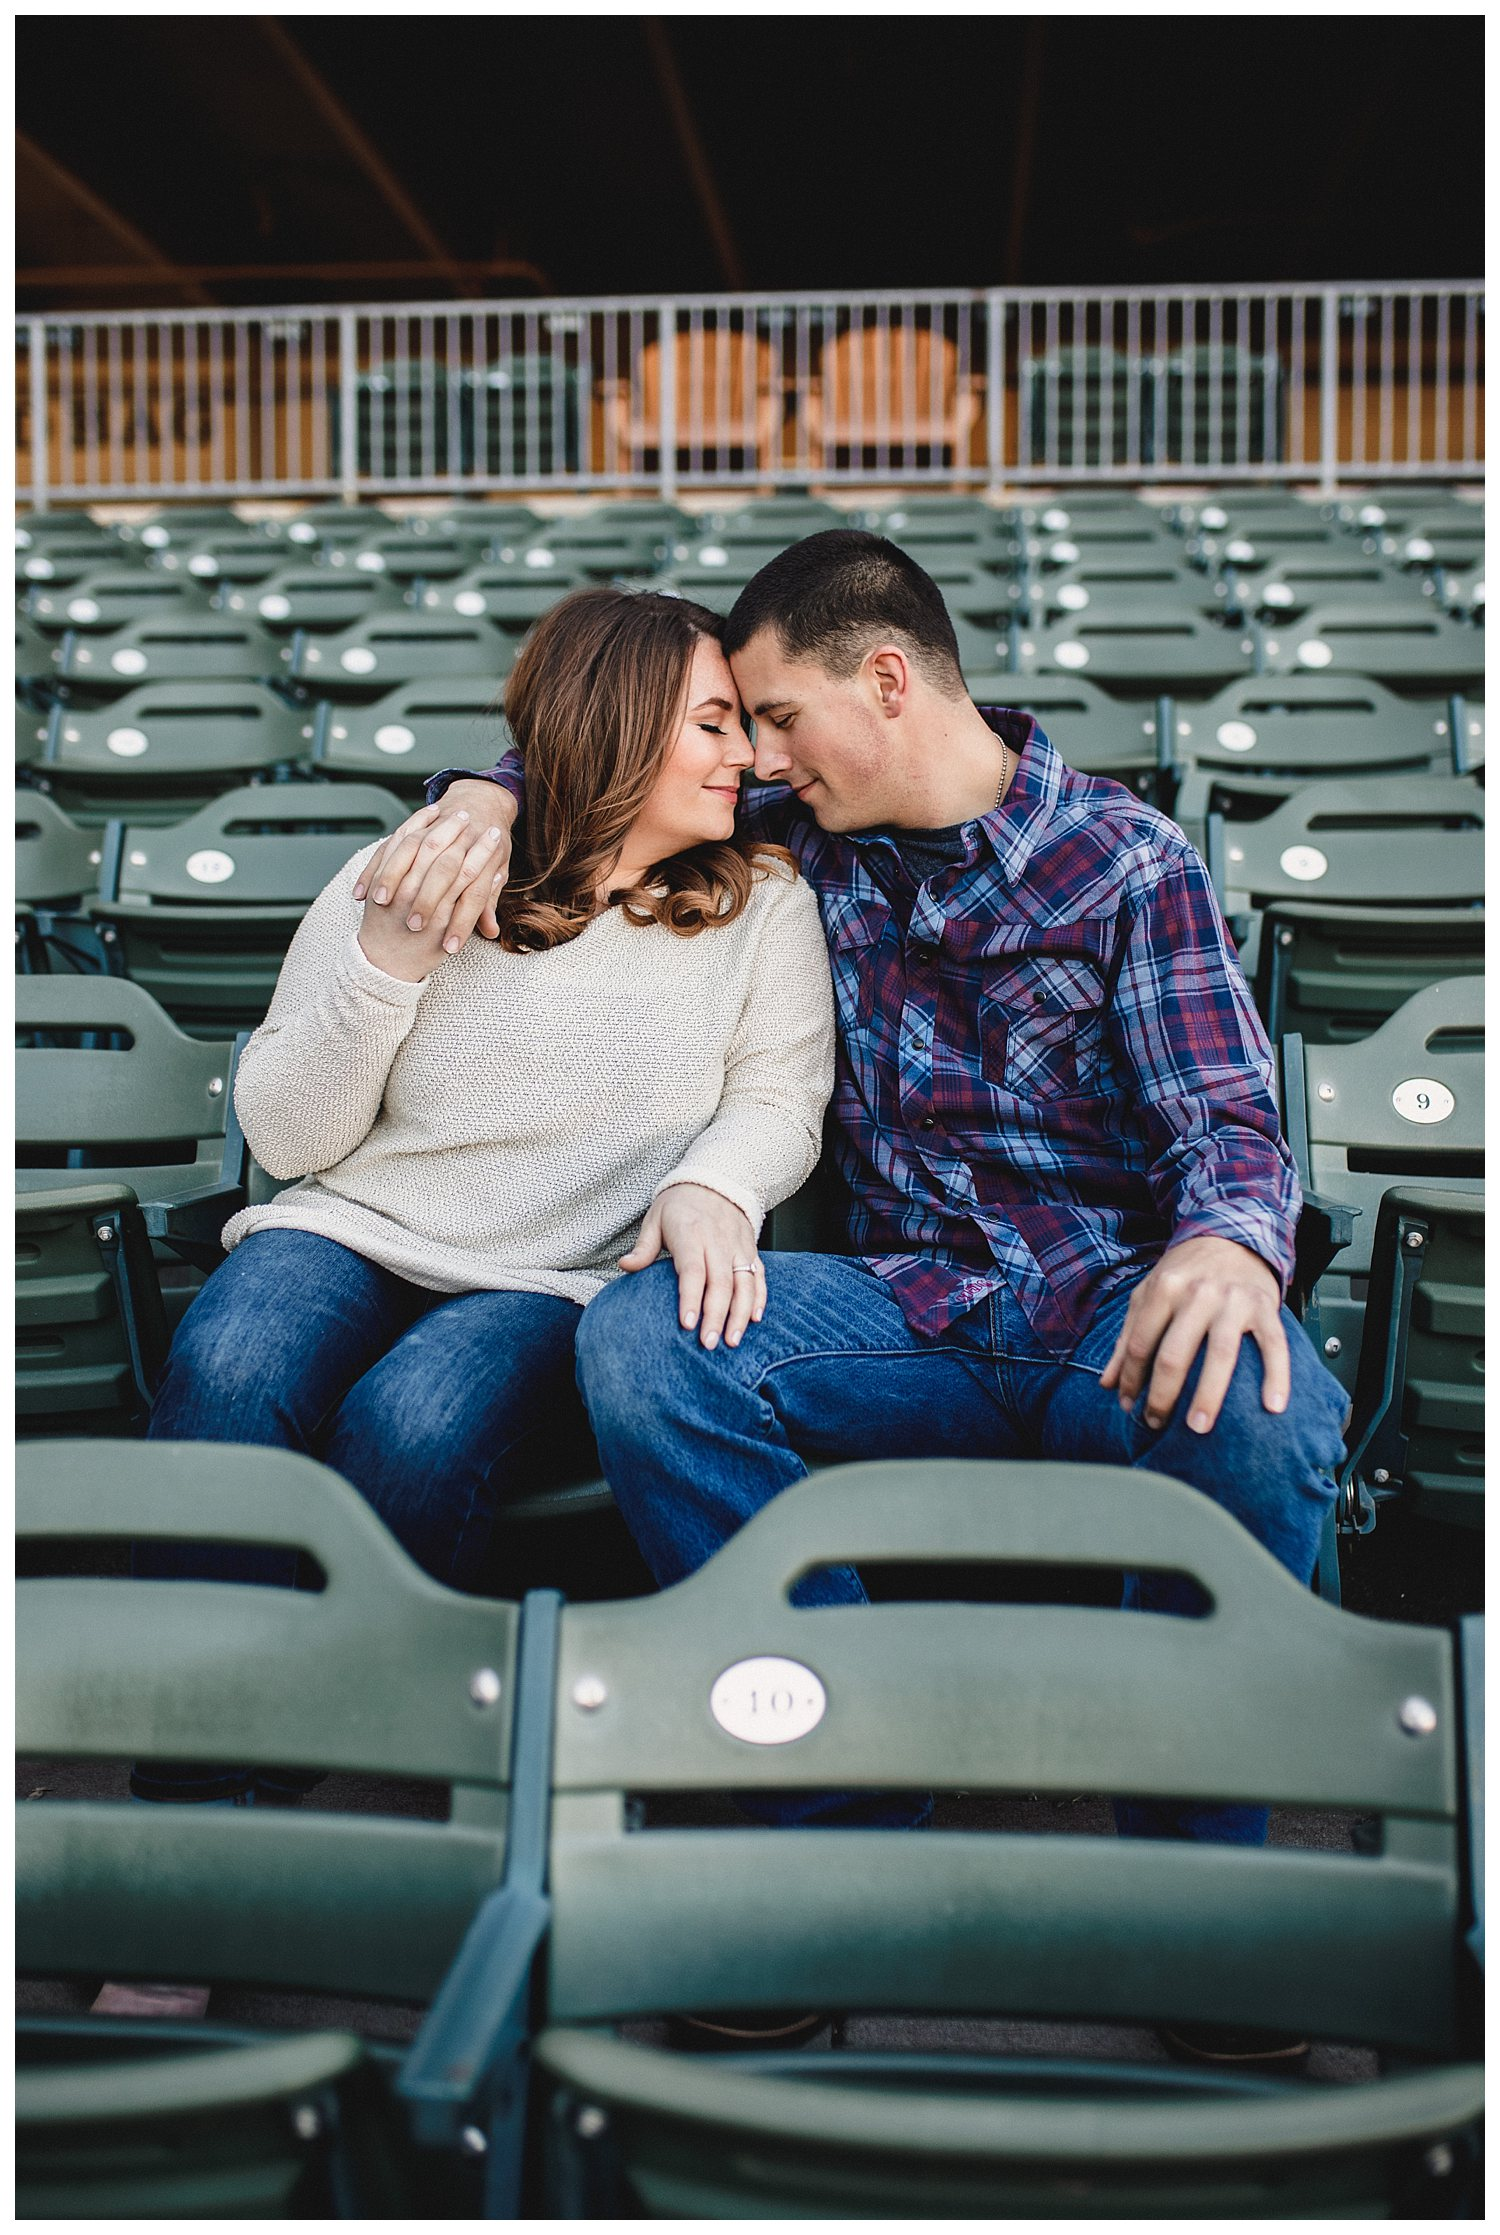 Kelsey_Diane_Photography_T-Bones_Stadium_Kansas_Wandering_Adventourus_Kansas_City_Engagement_0091.jpg